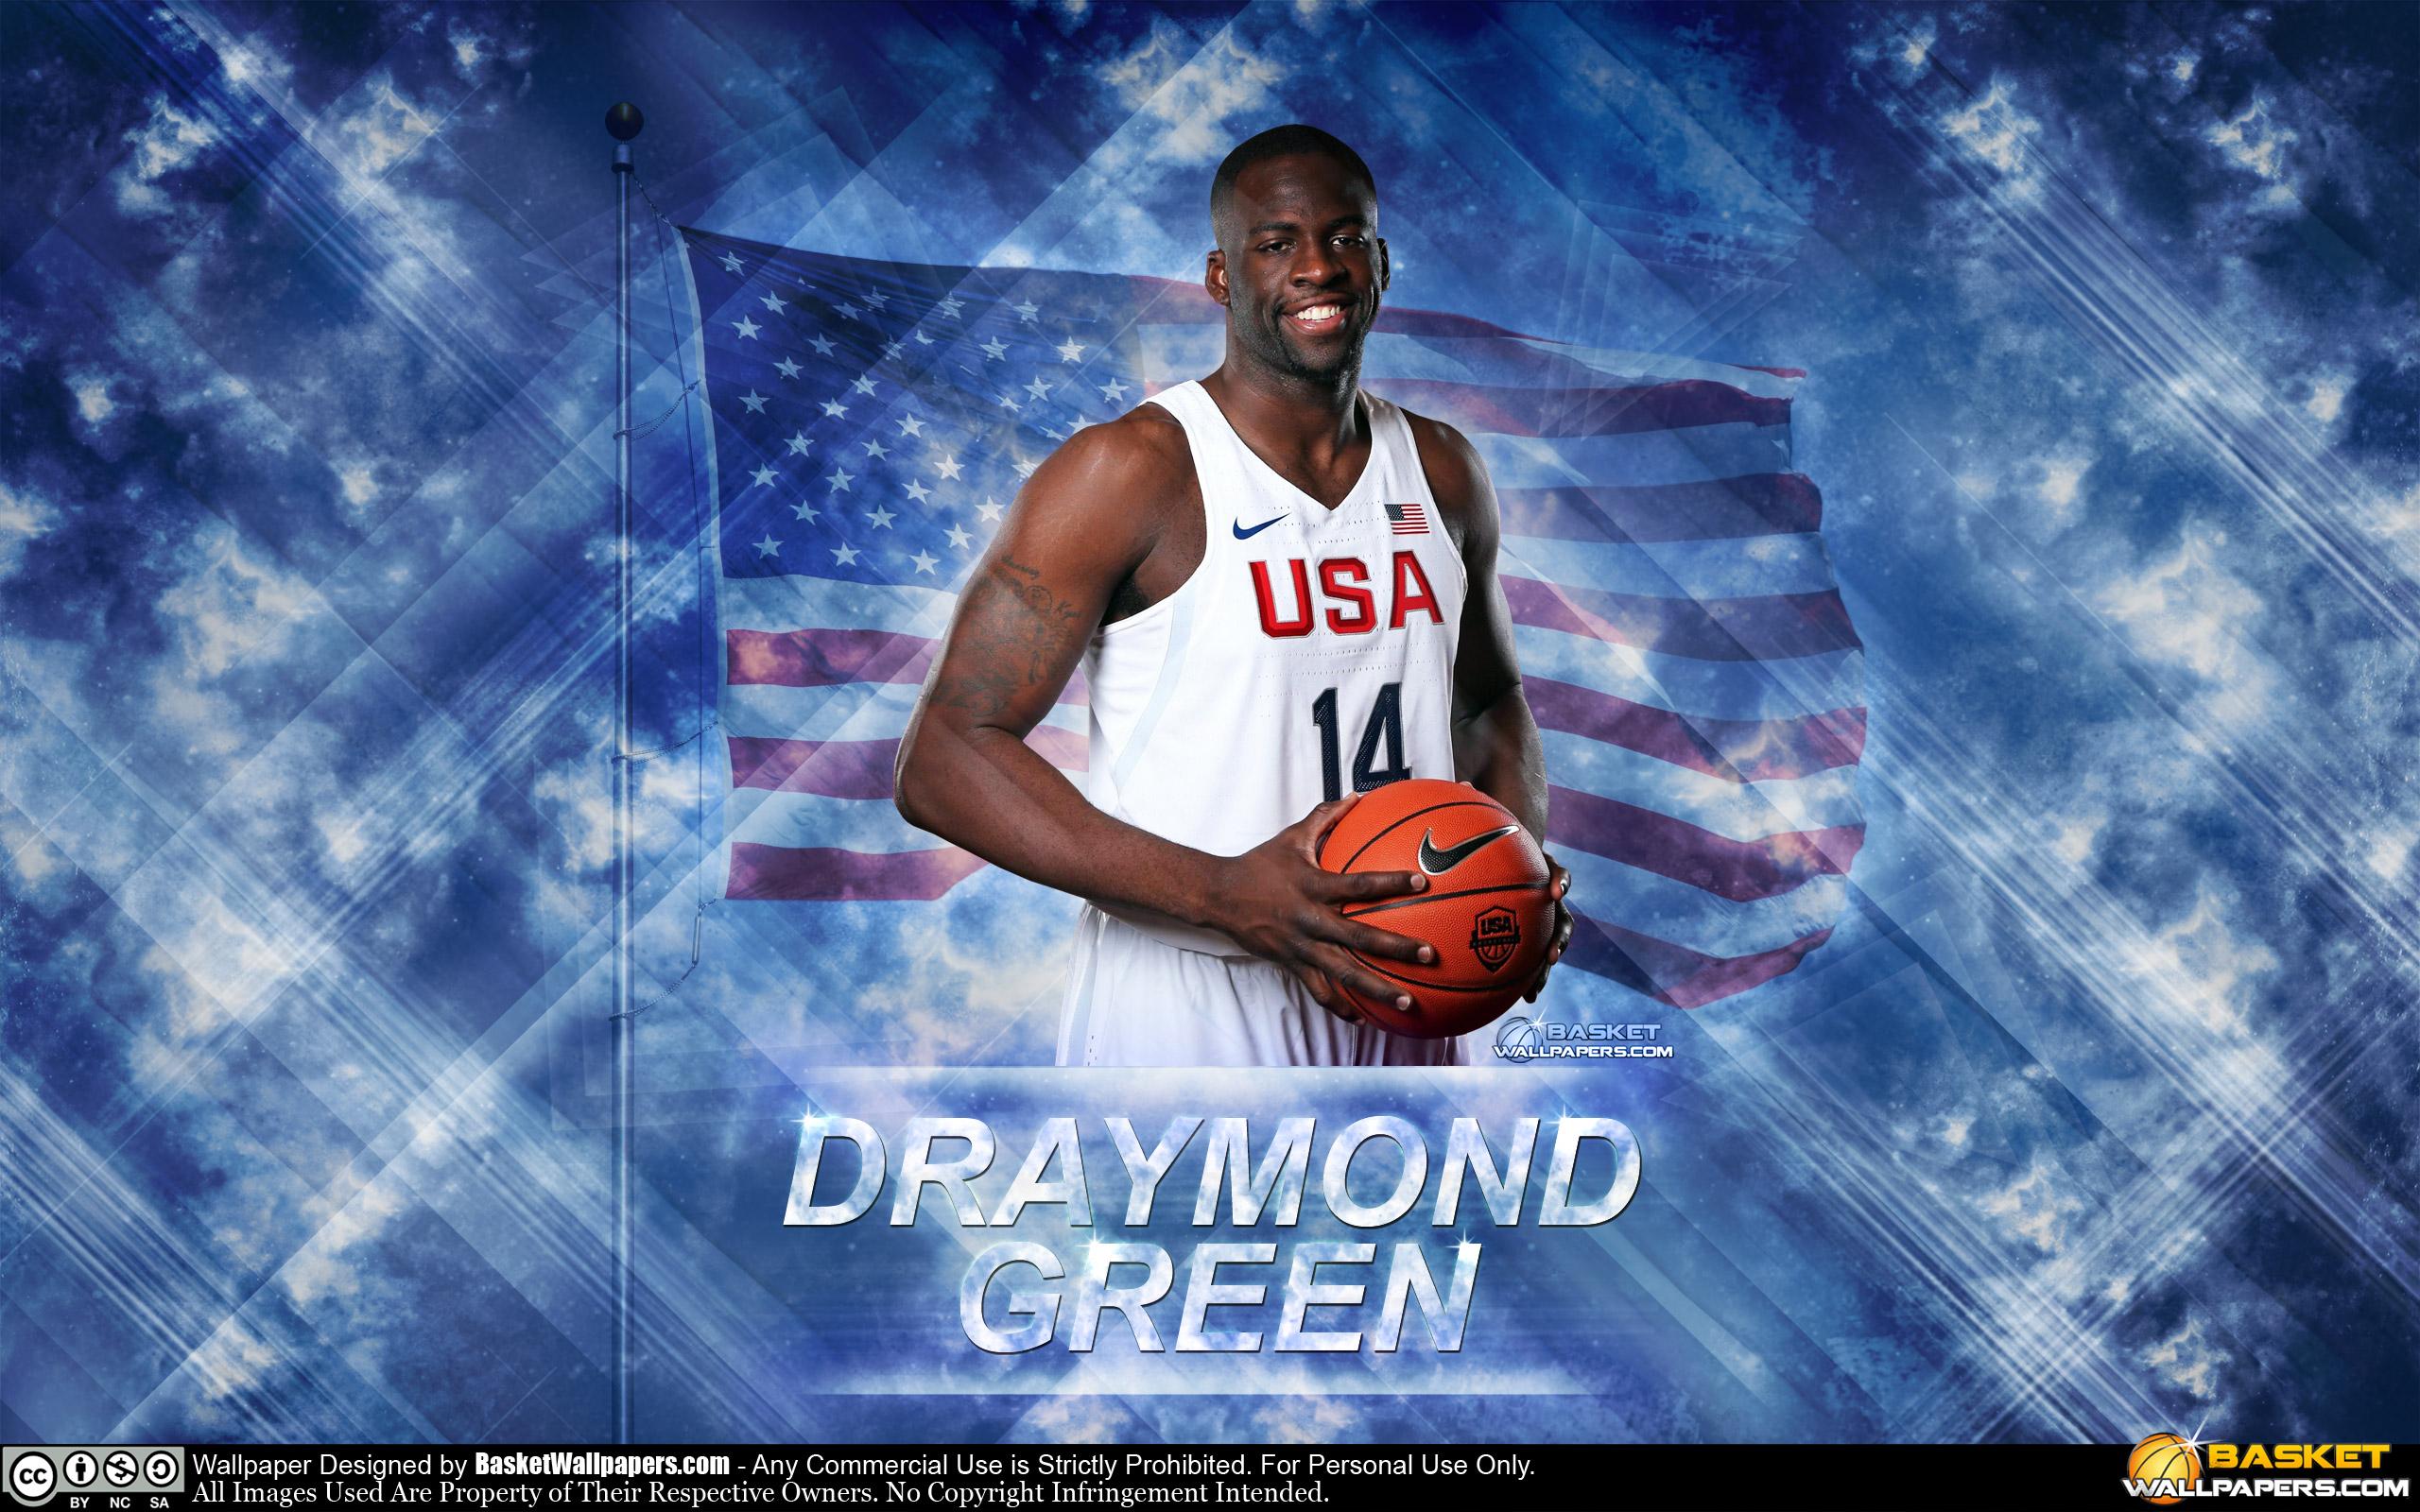 Draymond Green USA 2016 Olympics Wallpaper Basketball Wallpapers 2560x1600